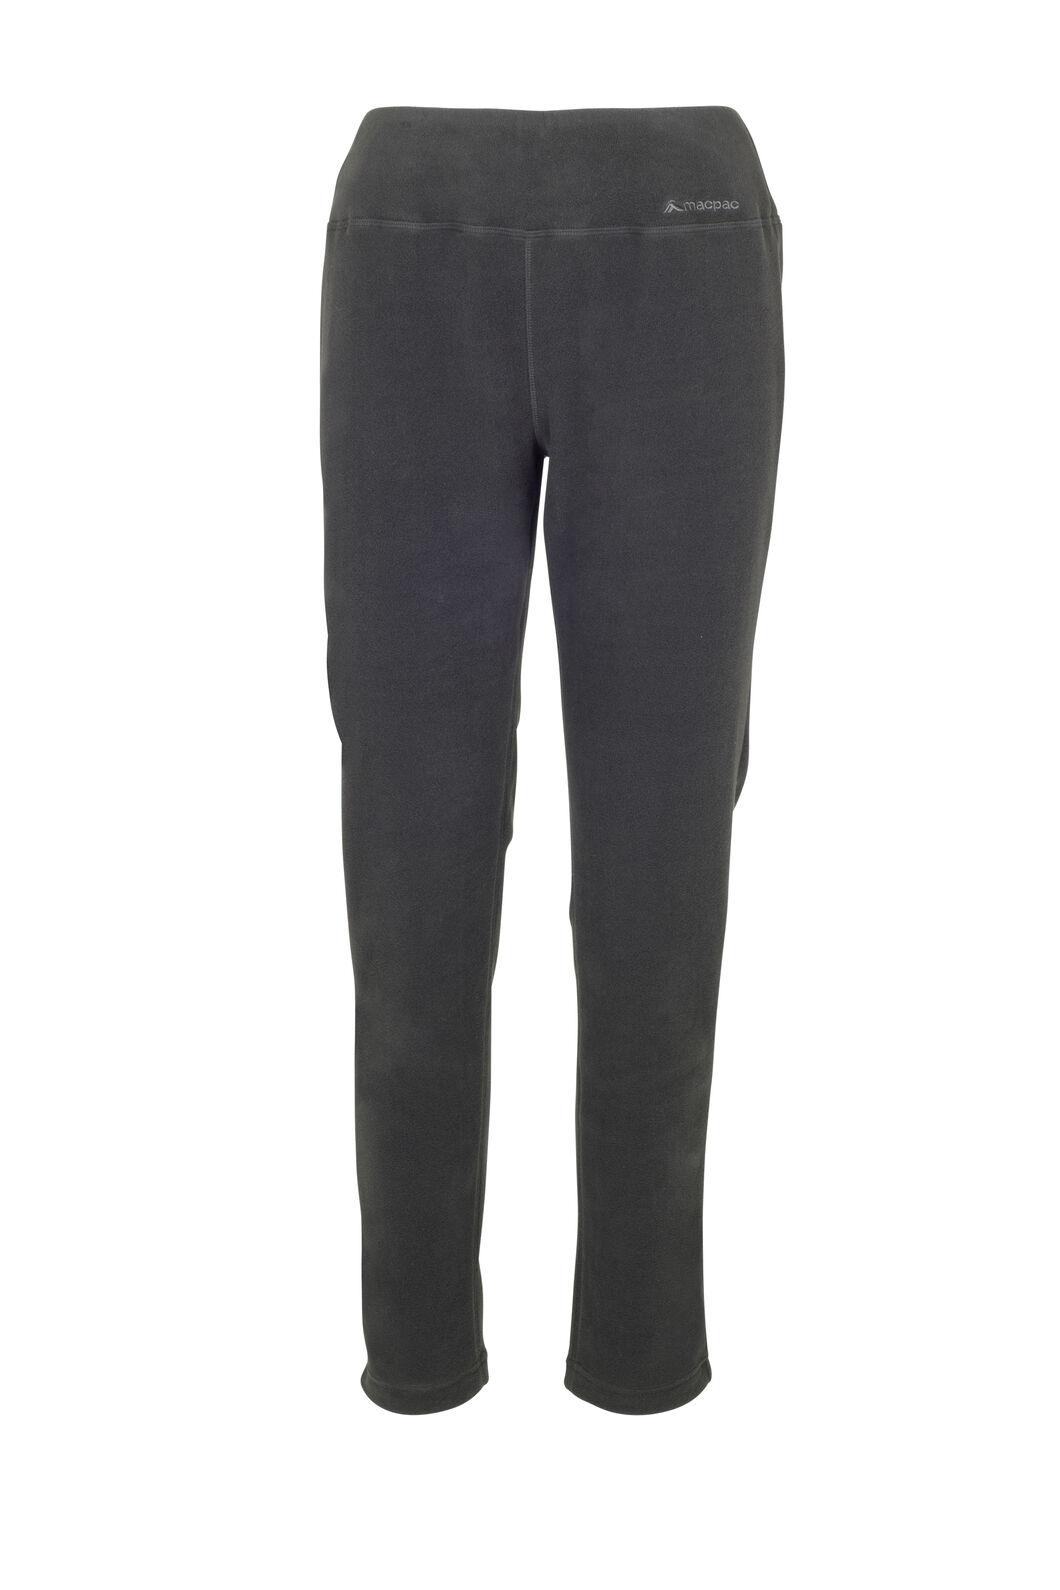 Macpac Kea Polartec® Micro Fleece® Pants — Women's, Black, hi-res